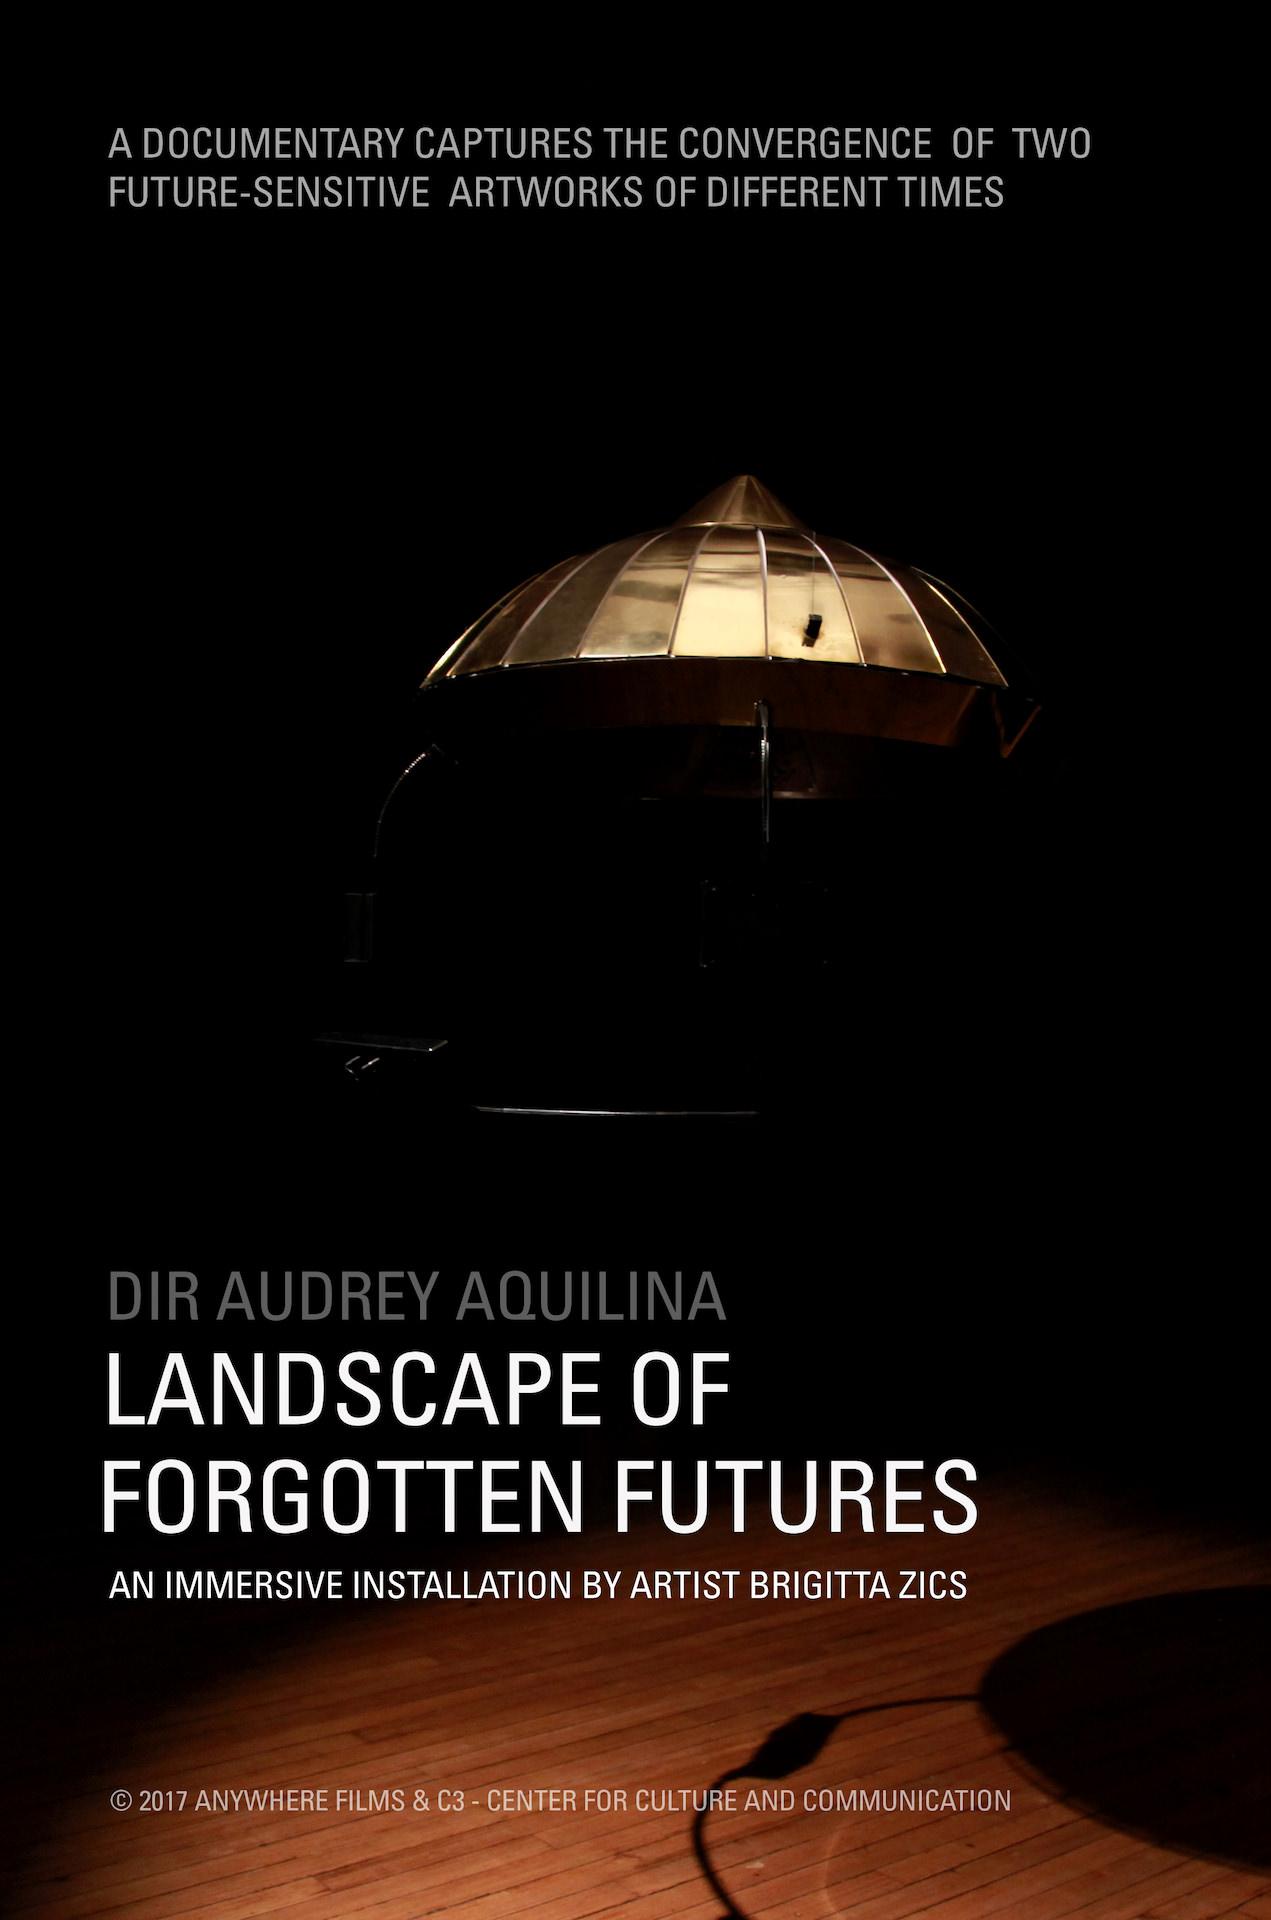 LandscapepfForgottenFutures